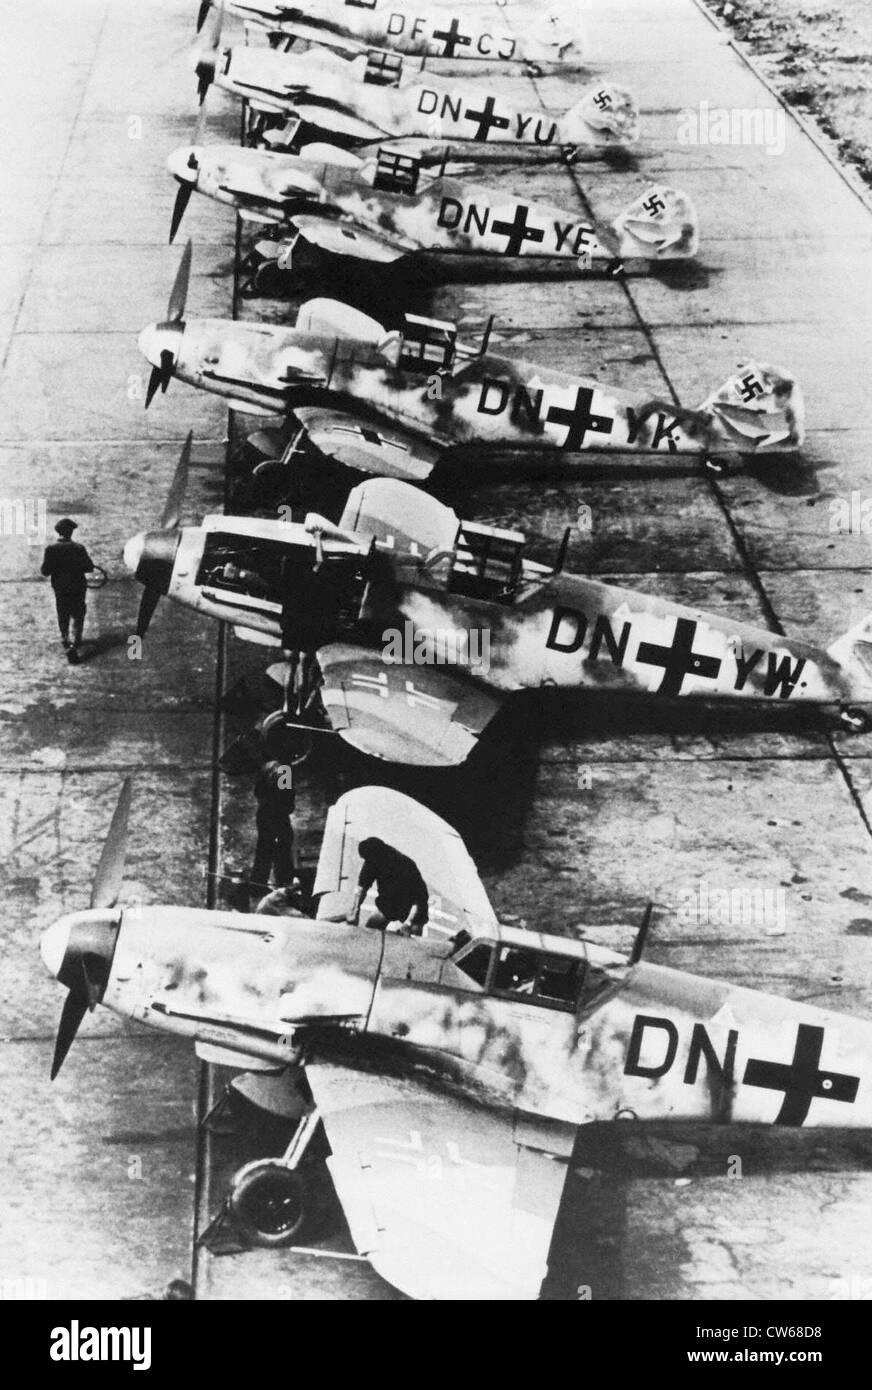 German Messerschmidt 109 fighters on an airfield, 1942 - Stock Image